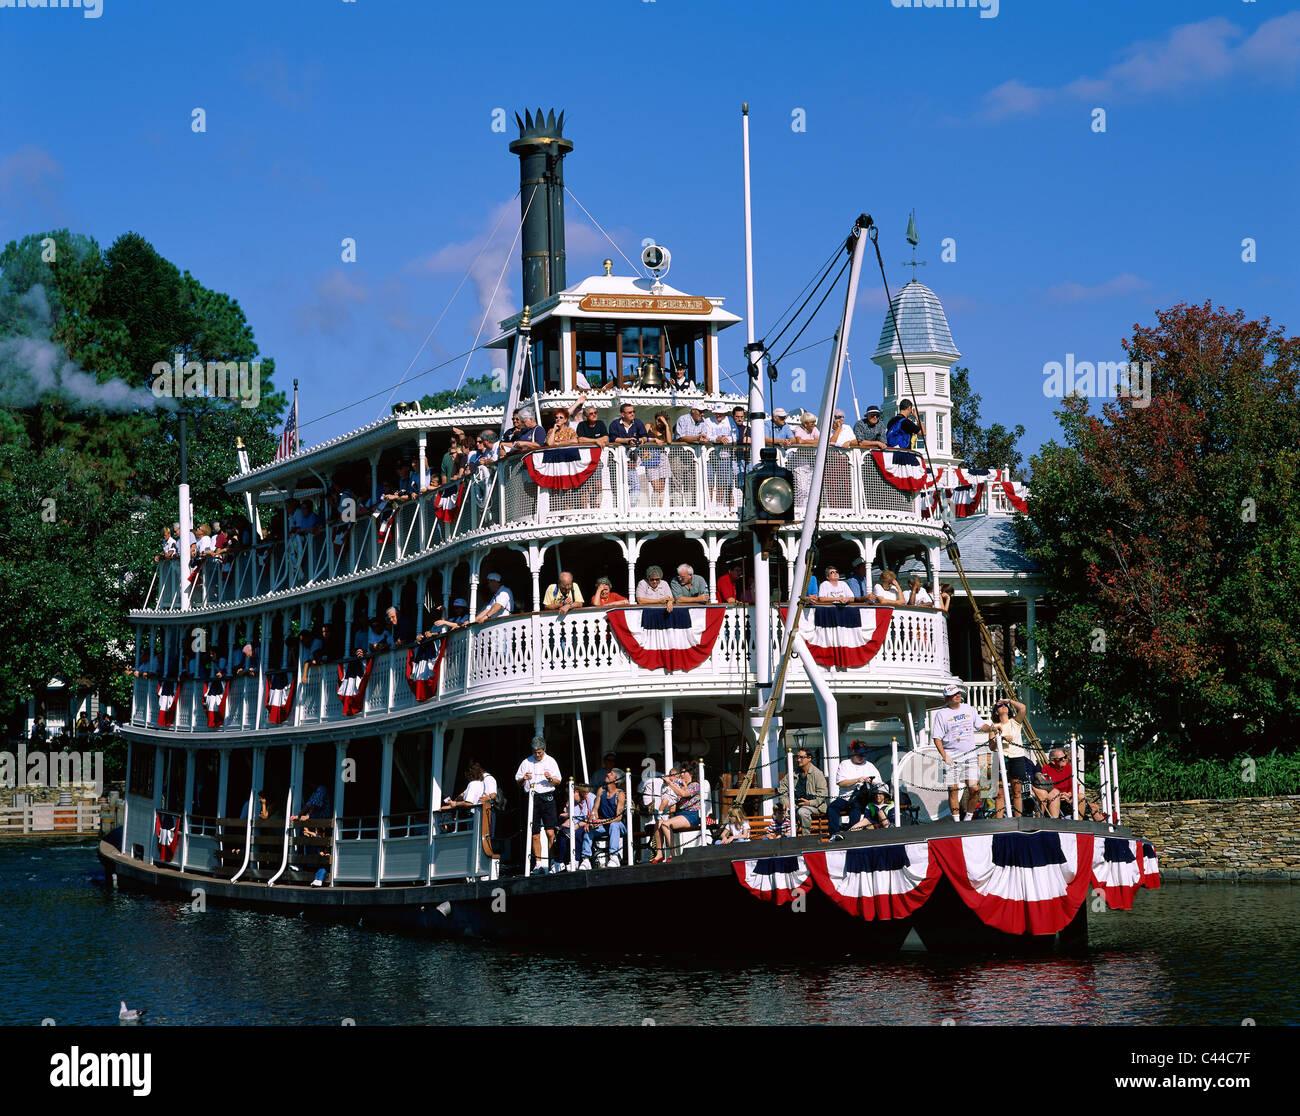 America, Belle, Florida, Holiday, Kingdom, Landmark, Liberty